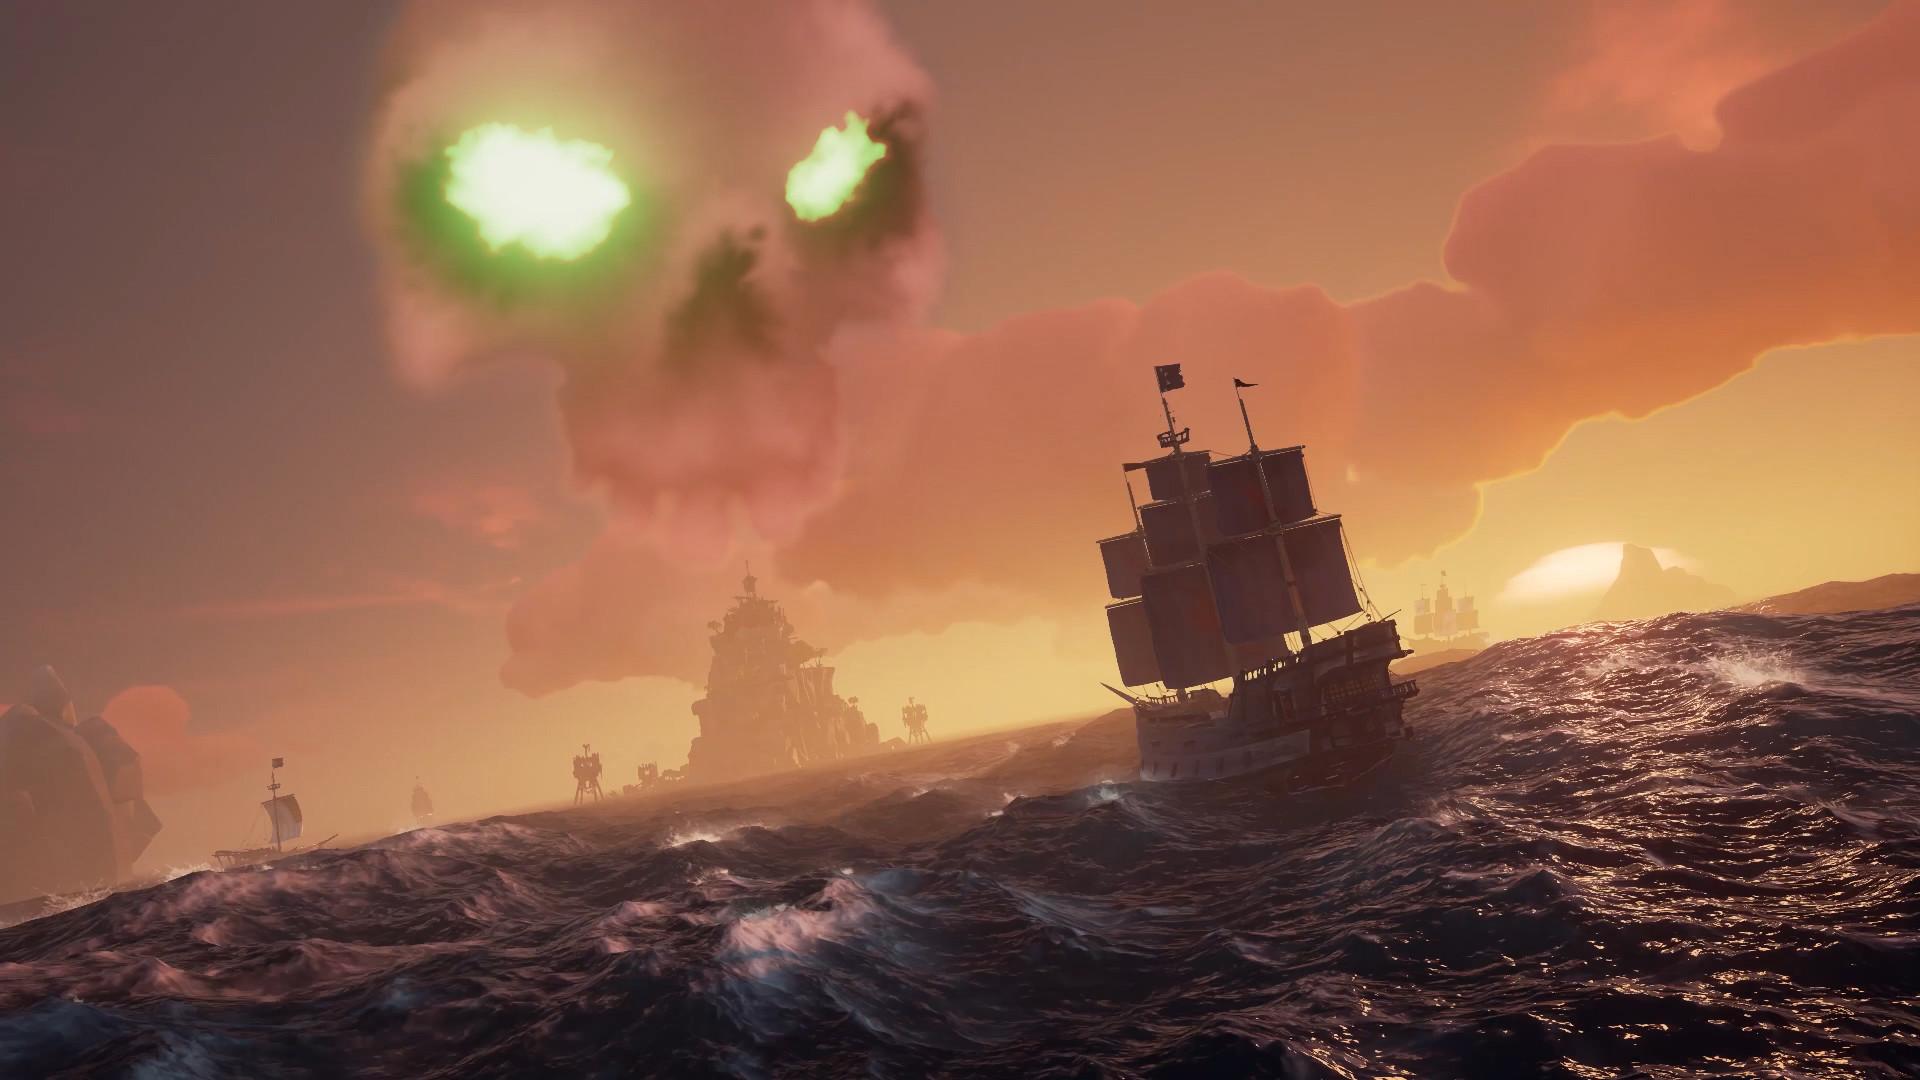 sea of thieves 4 - دانلود بازی آنلاین Sea of Thieves برای کامپیوتر